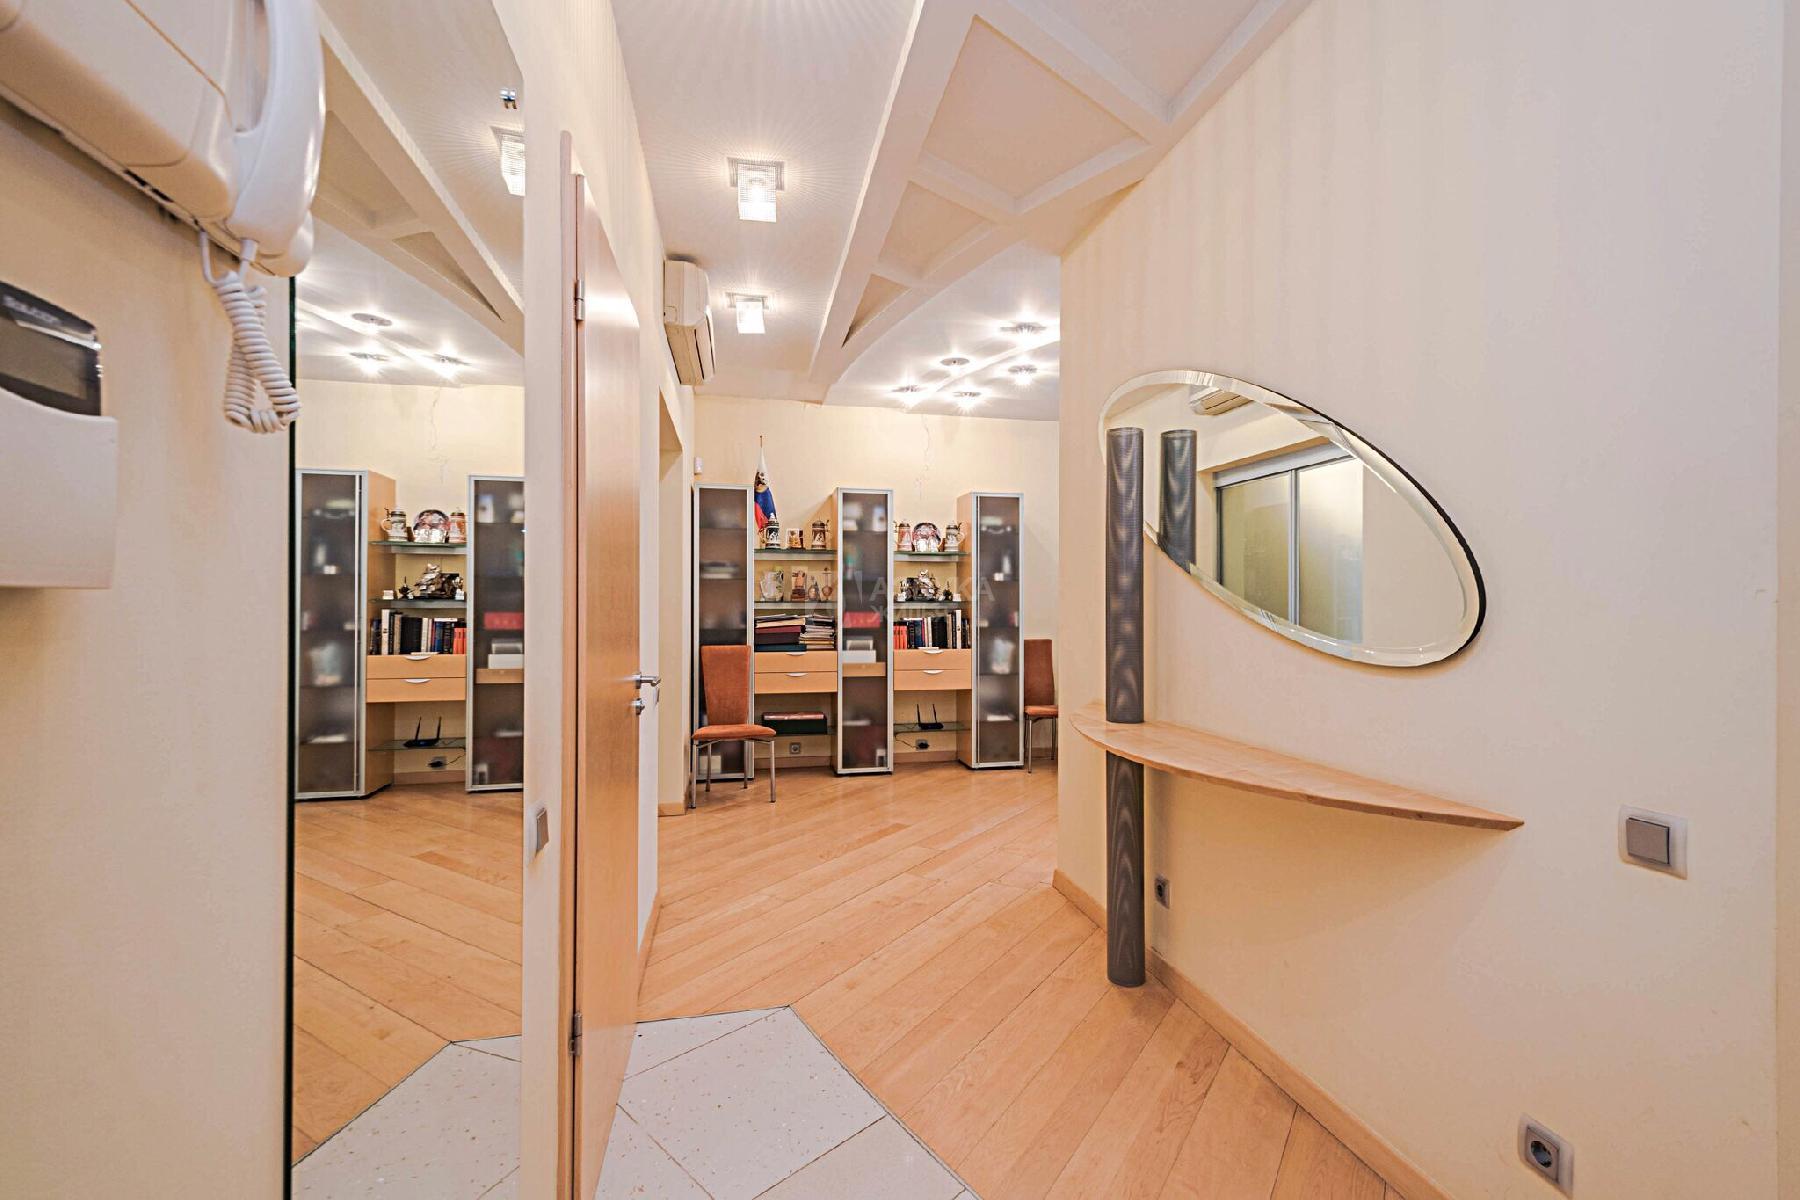 Фото №5 - 5-комнатная квартира, Москва, Авиационная улица 77, метро Щукинская